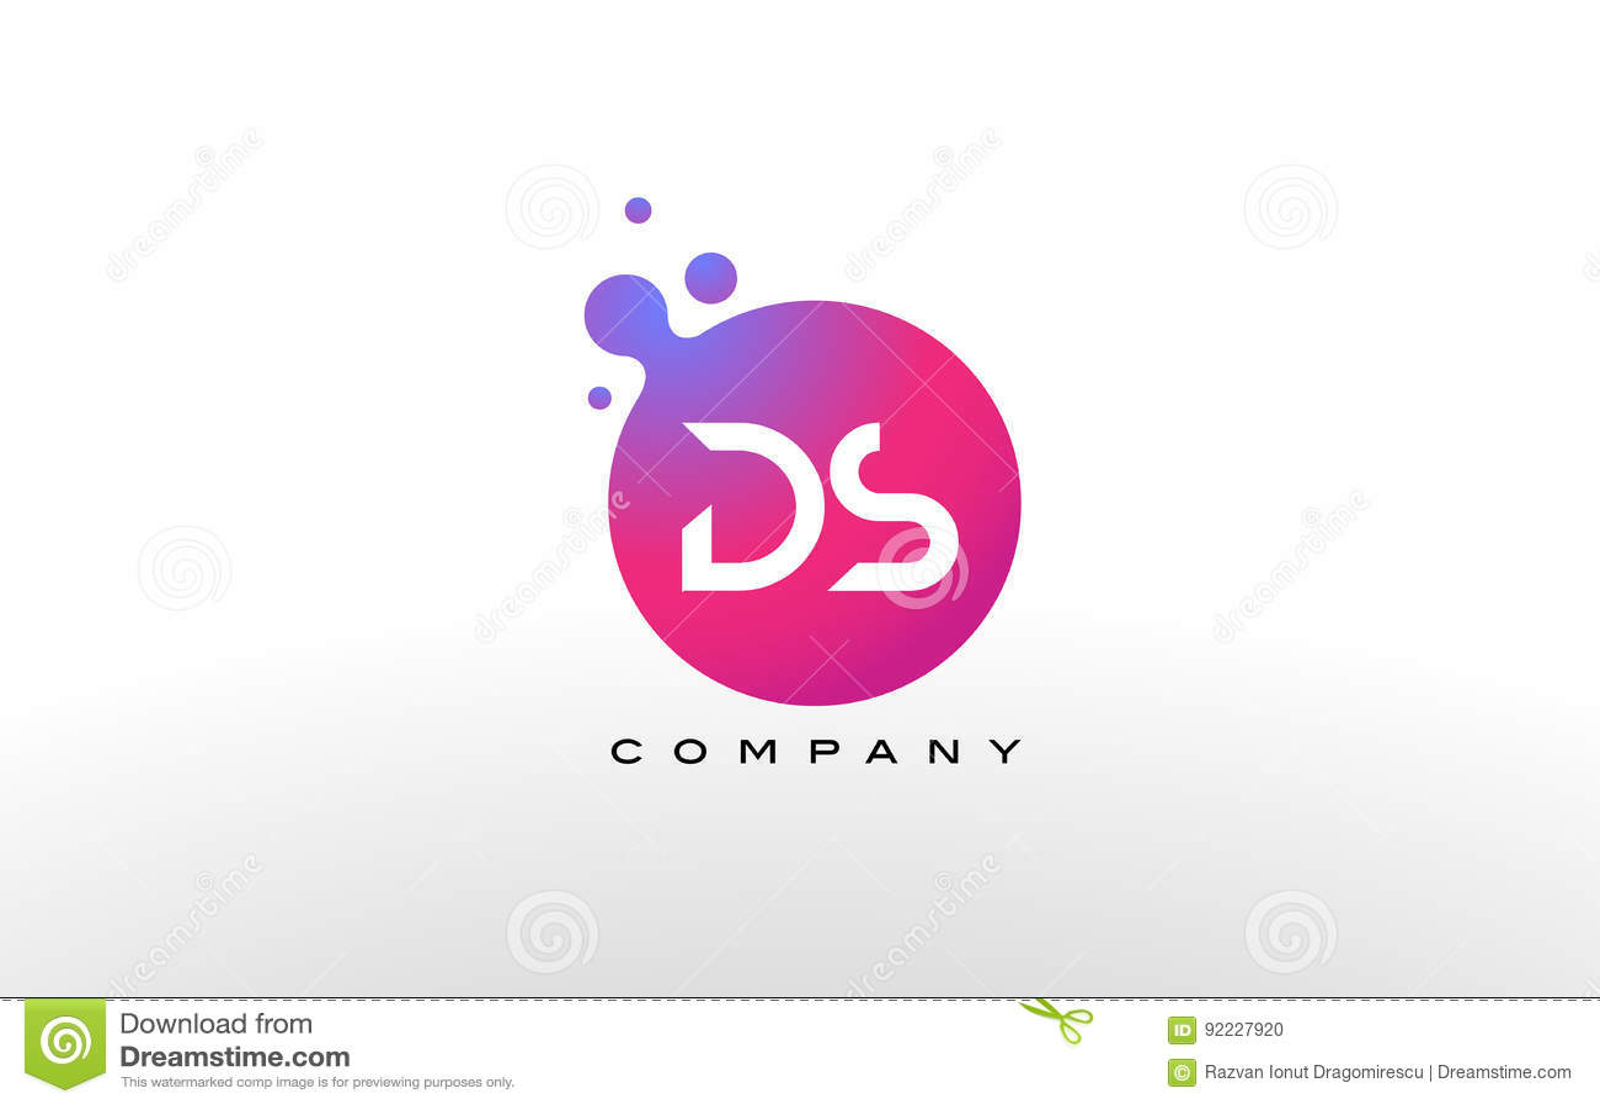 Ds Letter Logo Design Creative Modern Trendy Typography Stock ...